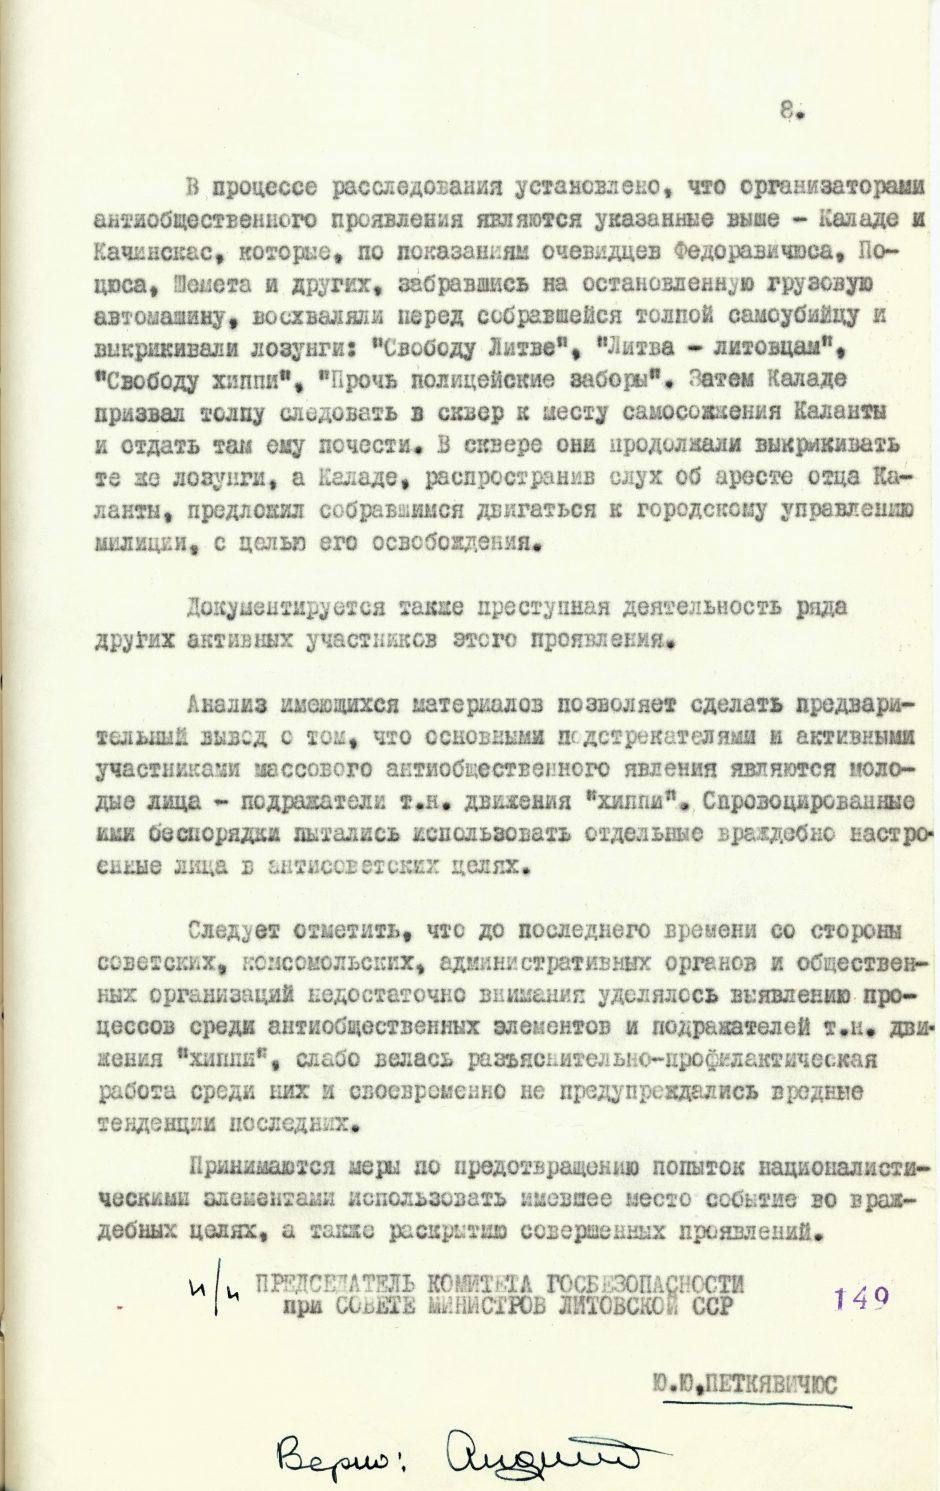 R. Kalantos aukos už laisvę nesutrypė net KGB